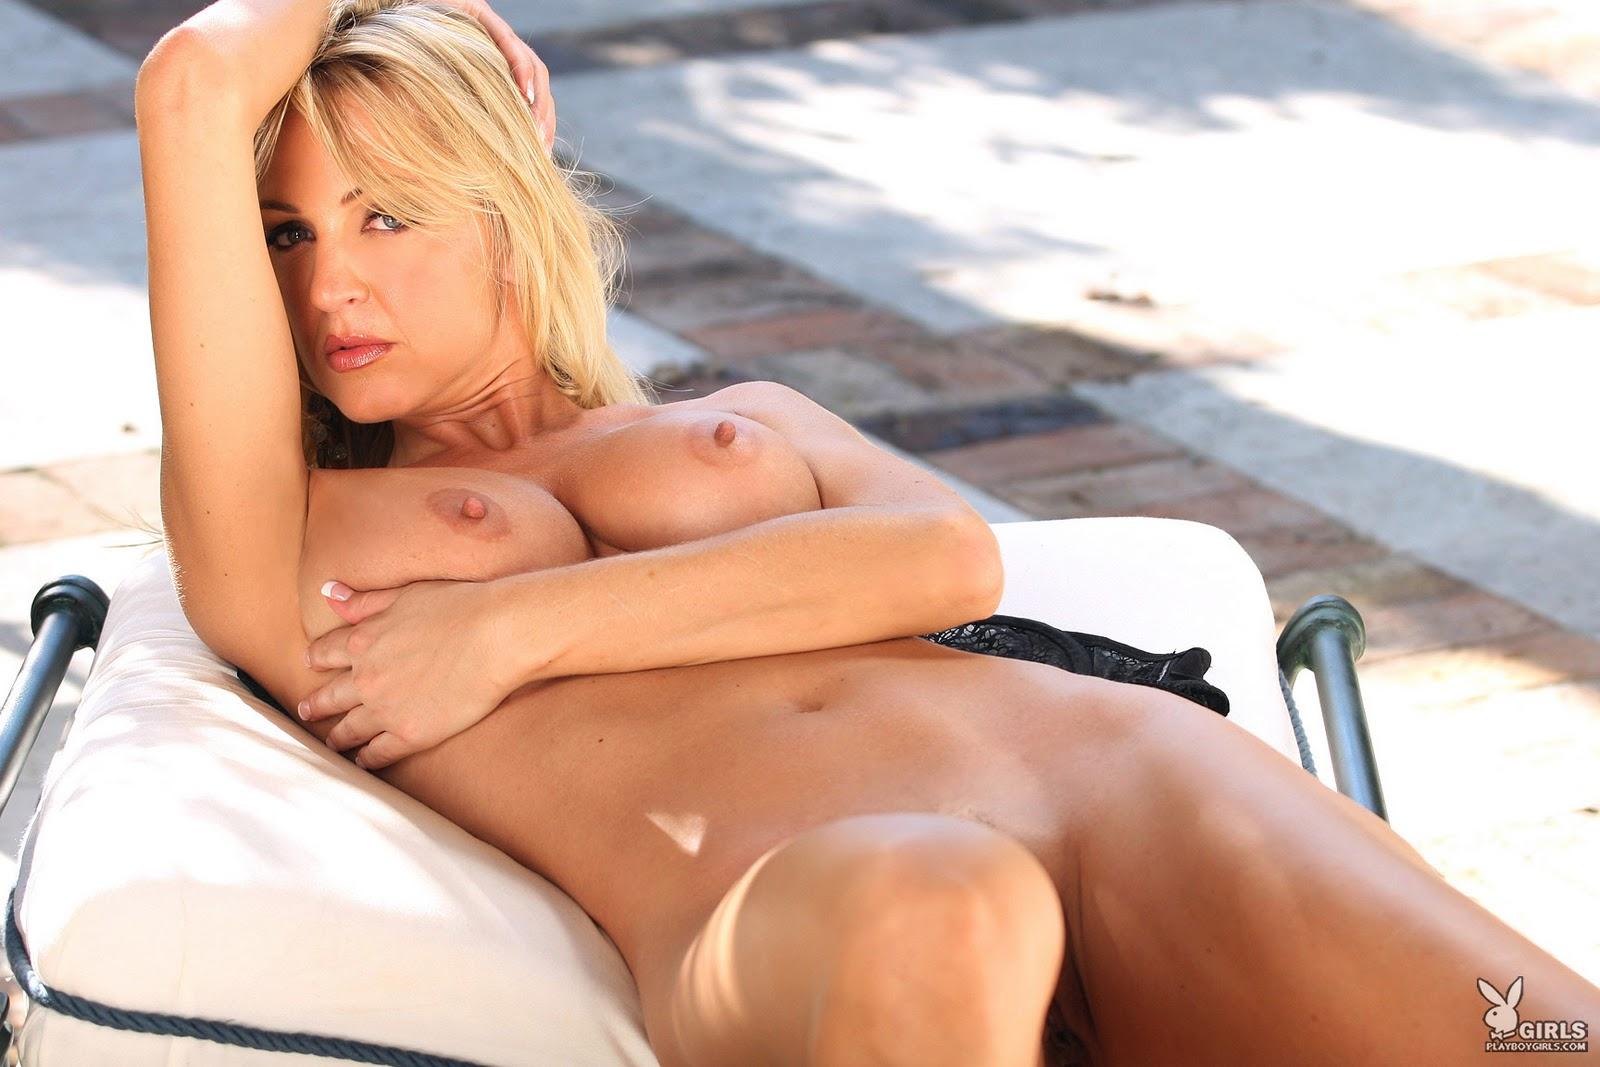 Erotic wife photo shoot stories